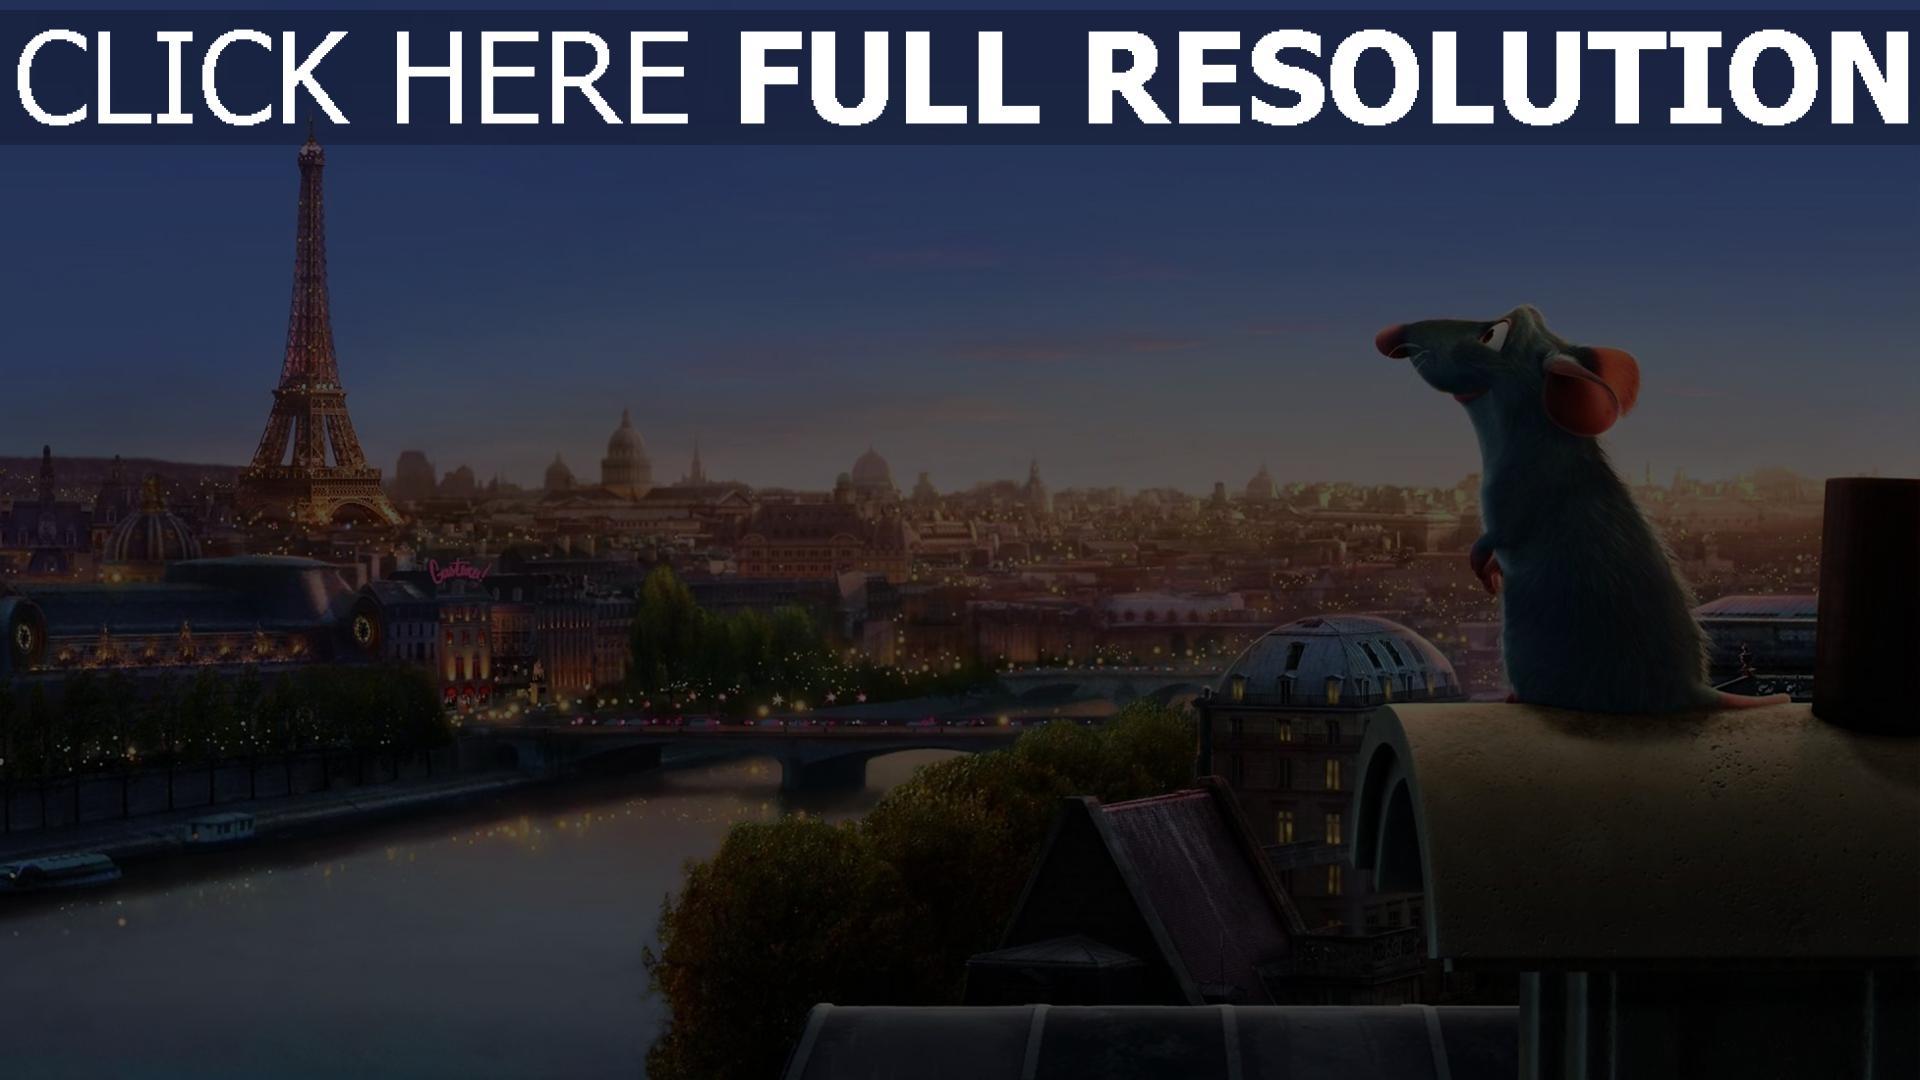 hd hintergrundbilder stadt eiffelturm pixar paris ratatouille ratte 1920x1080